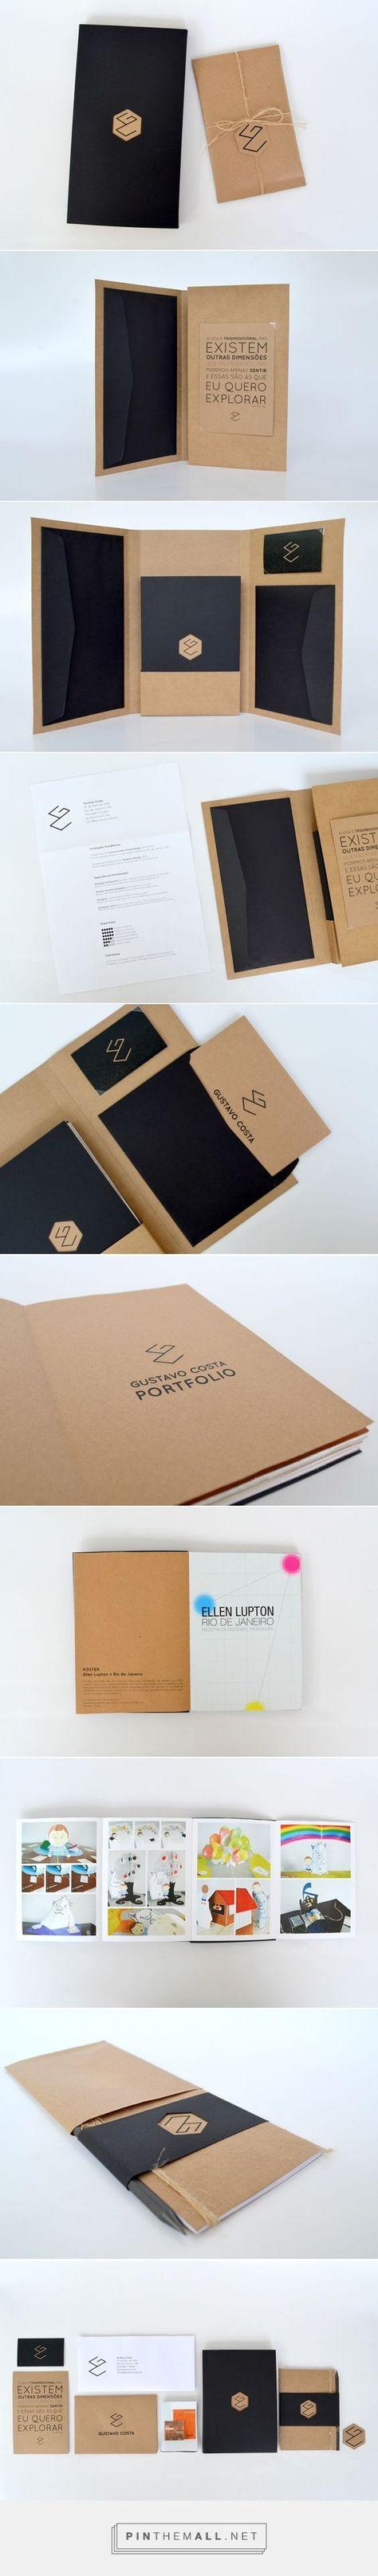 Self Promotion Kit | Gustavo Costa on Behance - created via http://pinthemall.net: